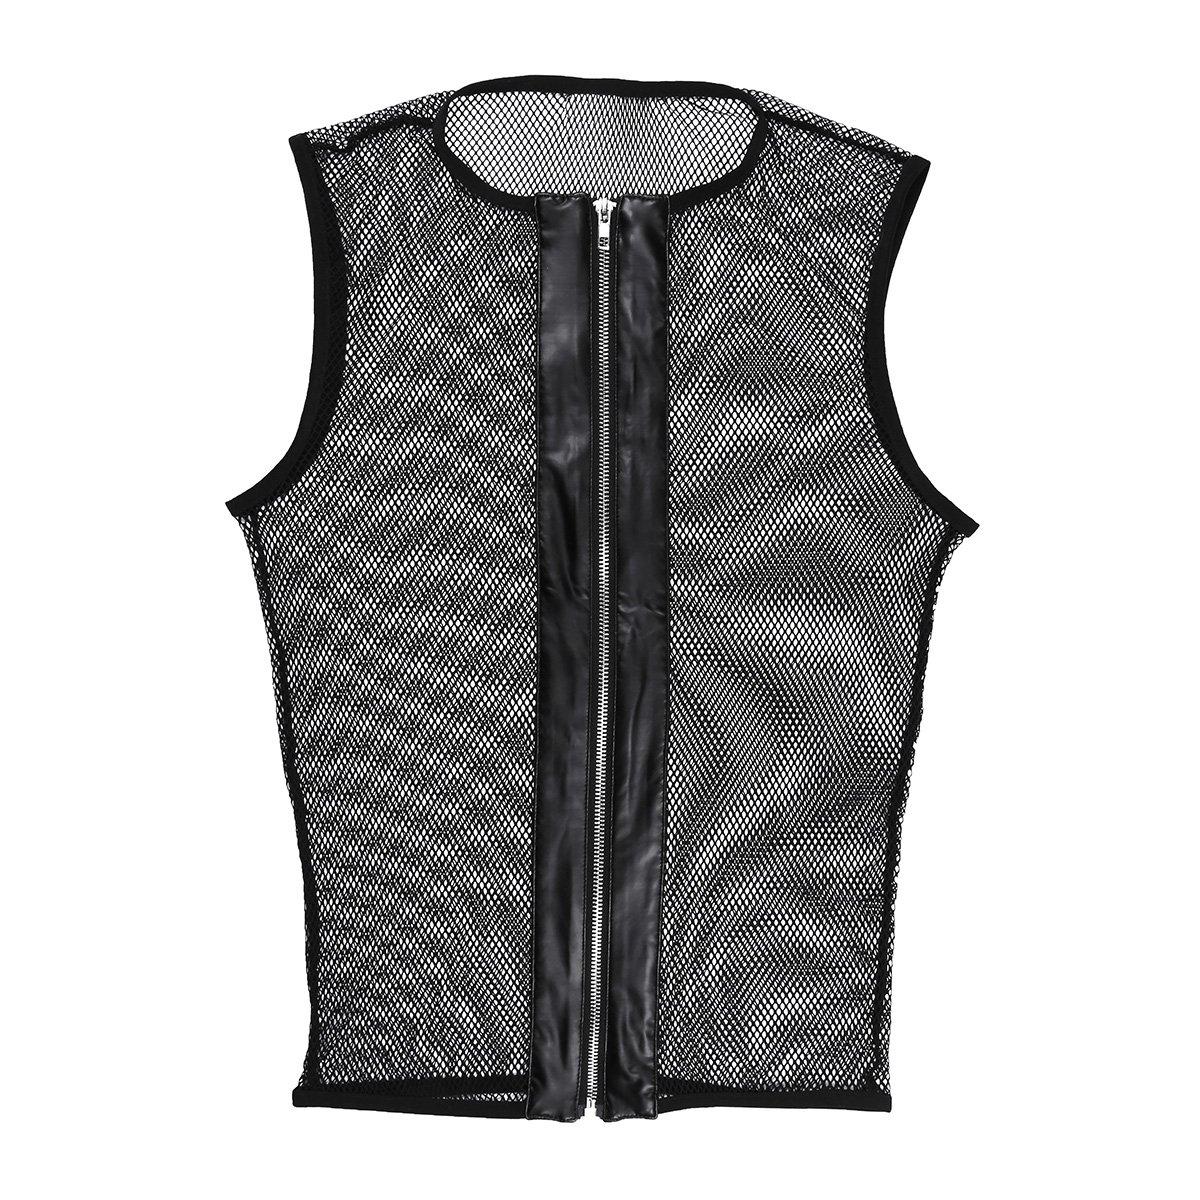 27e57323e6ae55 Agoky Men s Fishnet See-Through Tank Top Vest Mesh Muscle Zipper Tank Shirts   Amazon.co.uk  Clothing